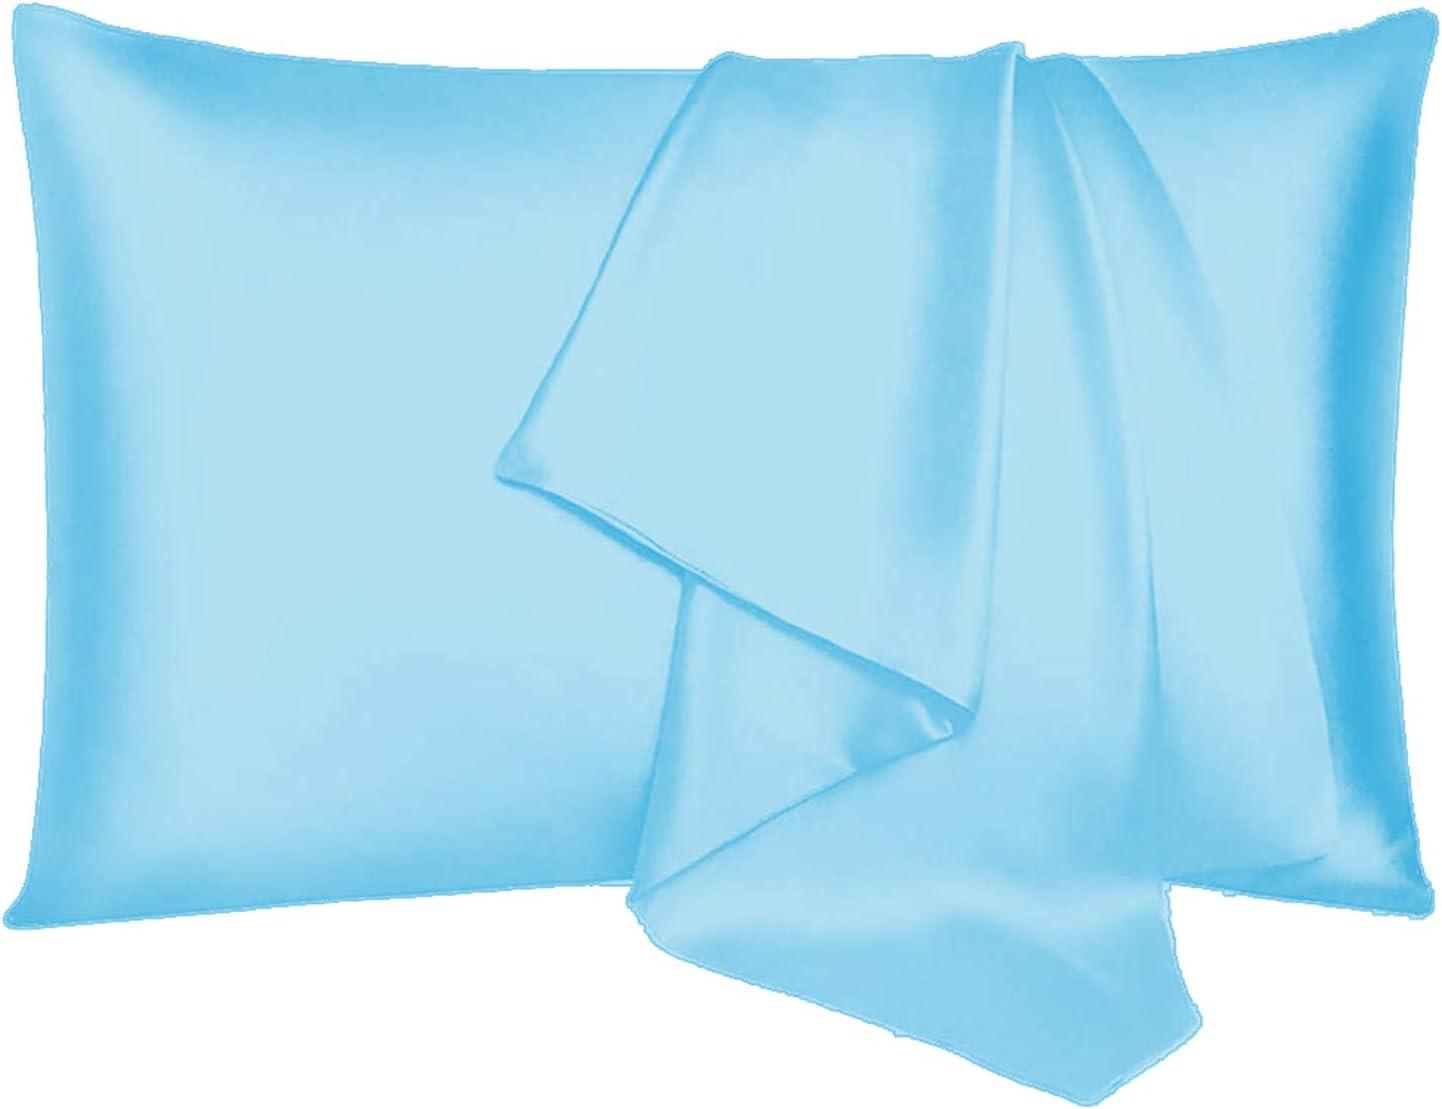 Lukeville Luxury Linen 1 Piece Mulberry 100% Pillowcase wit Silk 今だけ限定15%OFFクーポン発行中 日本製